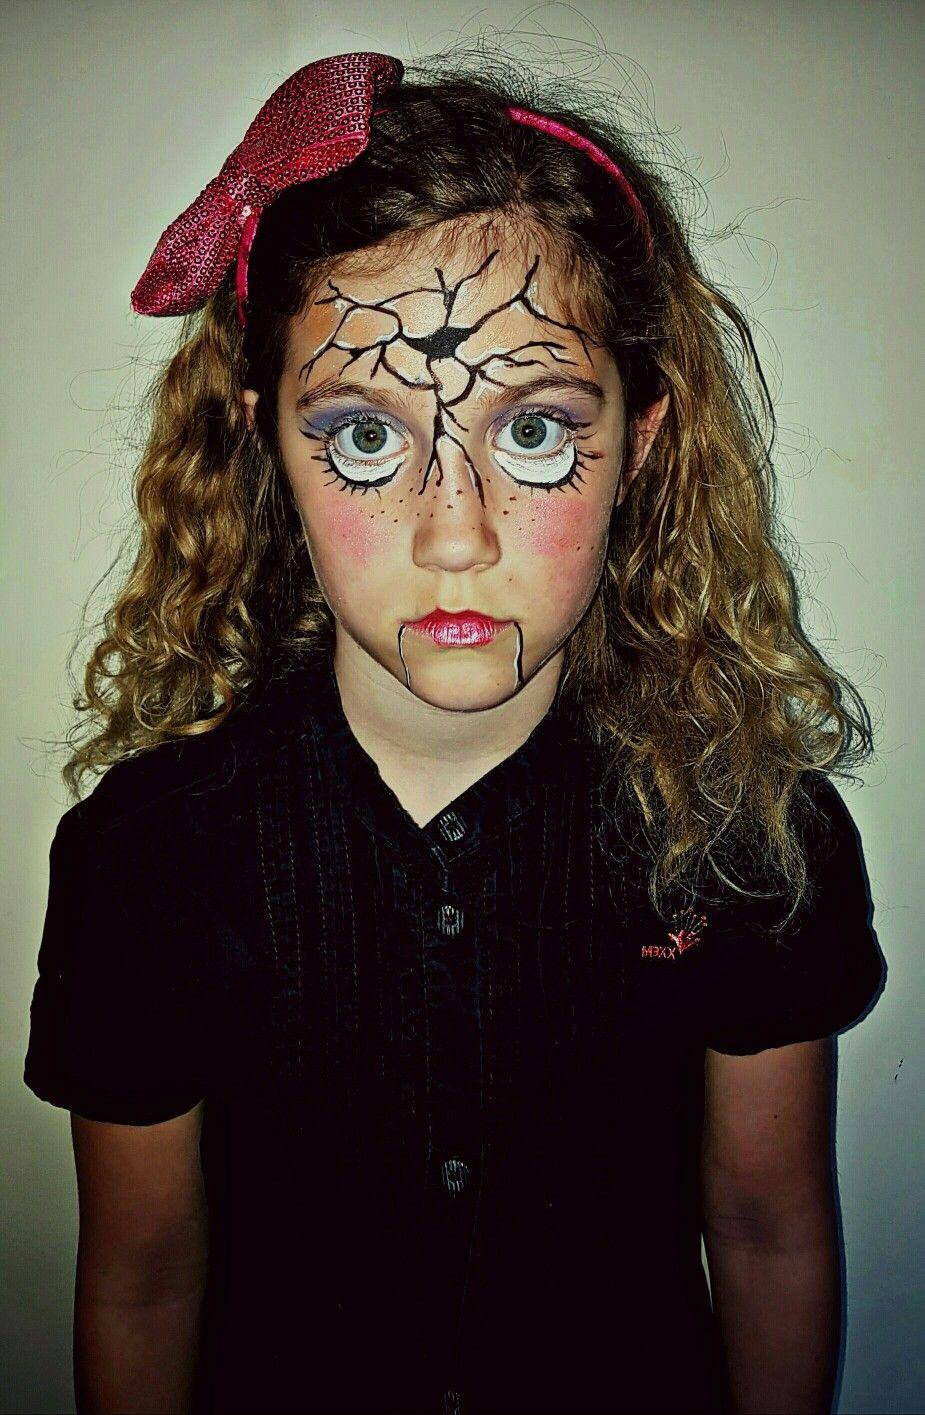 Broken doll facepaint